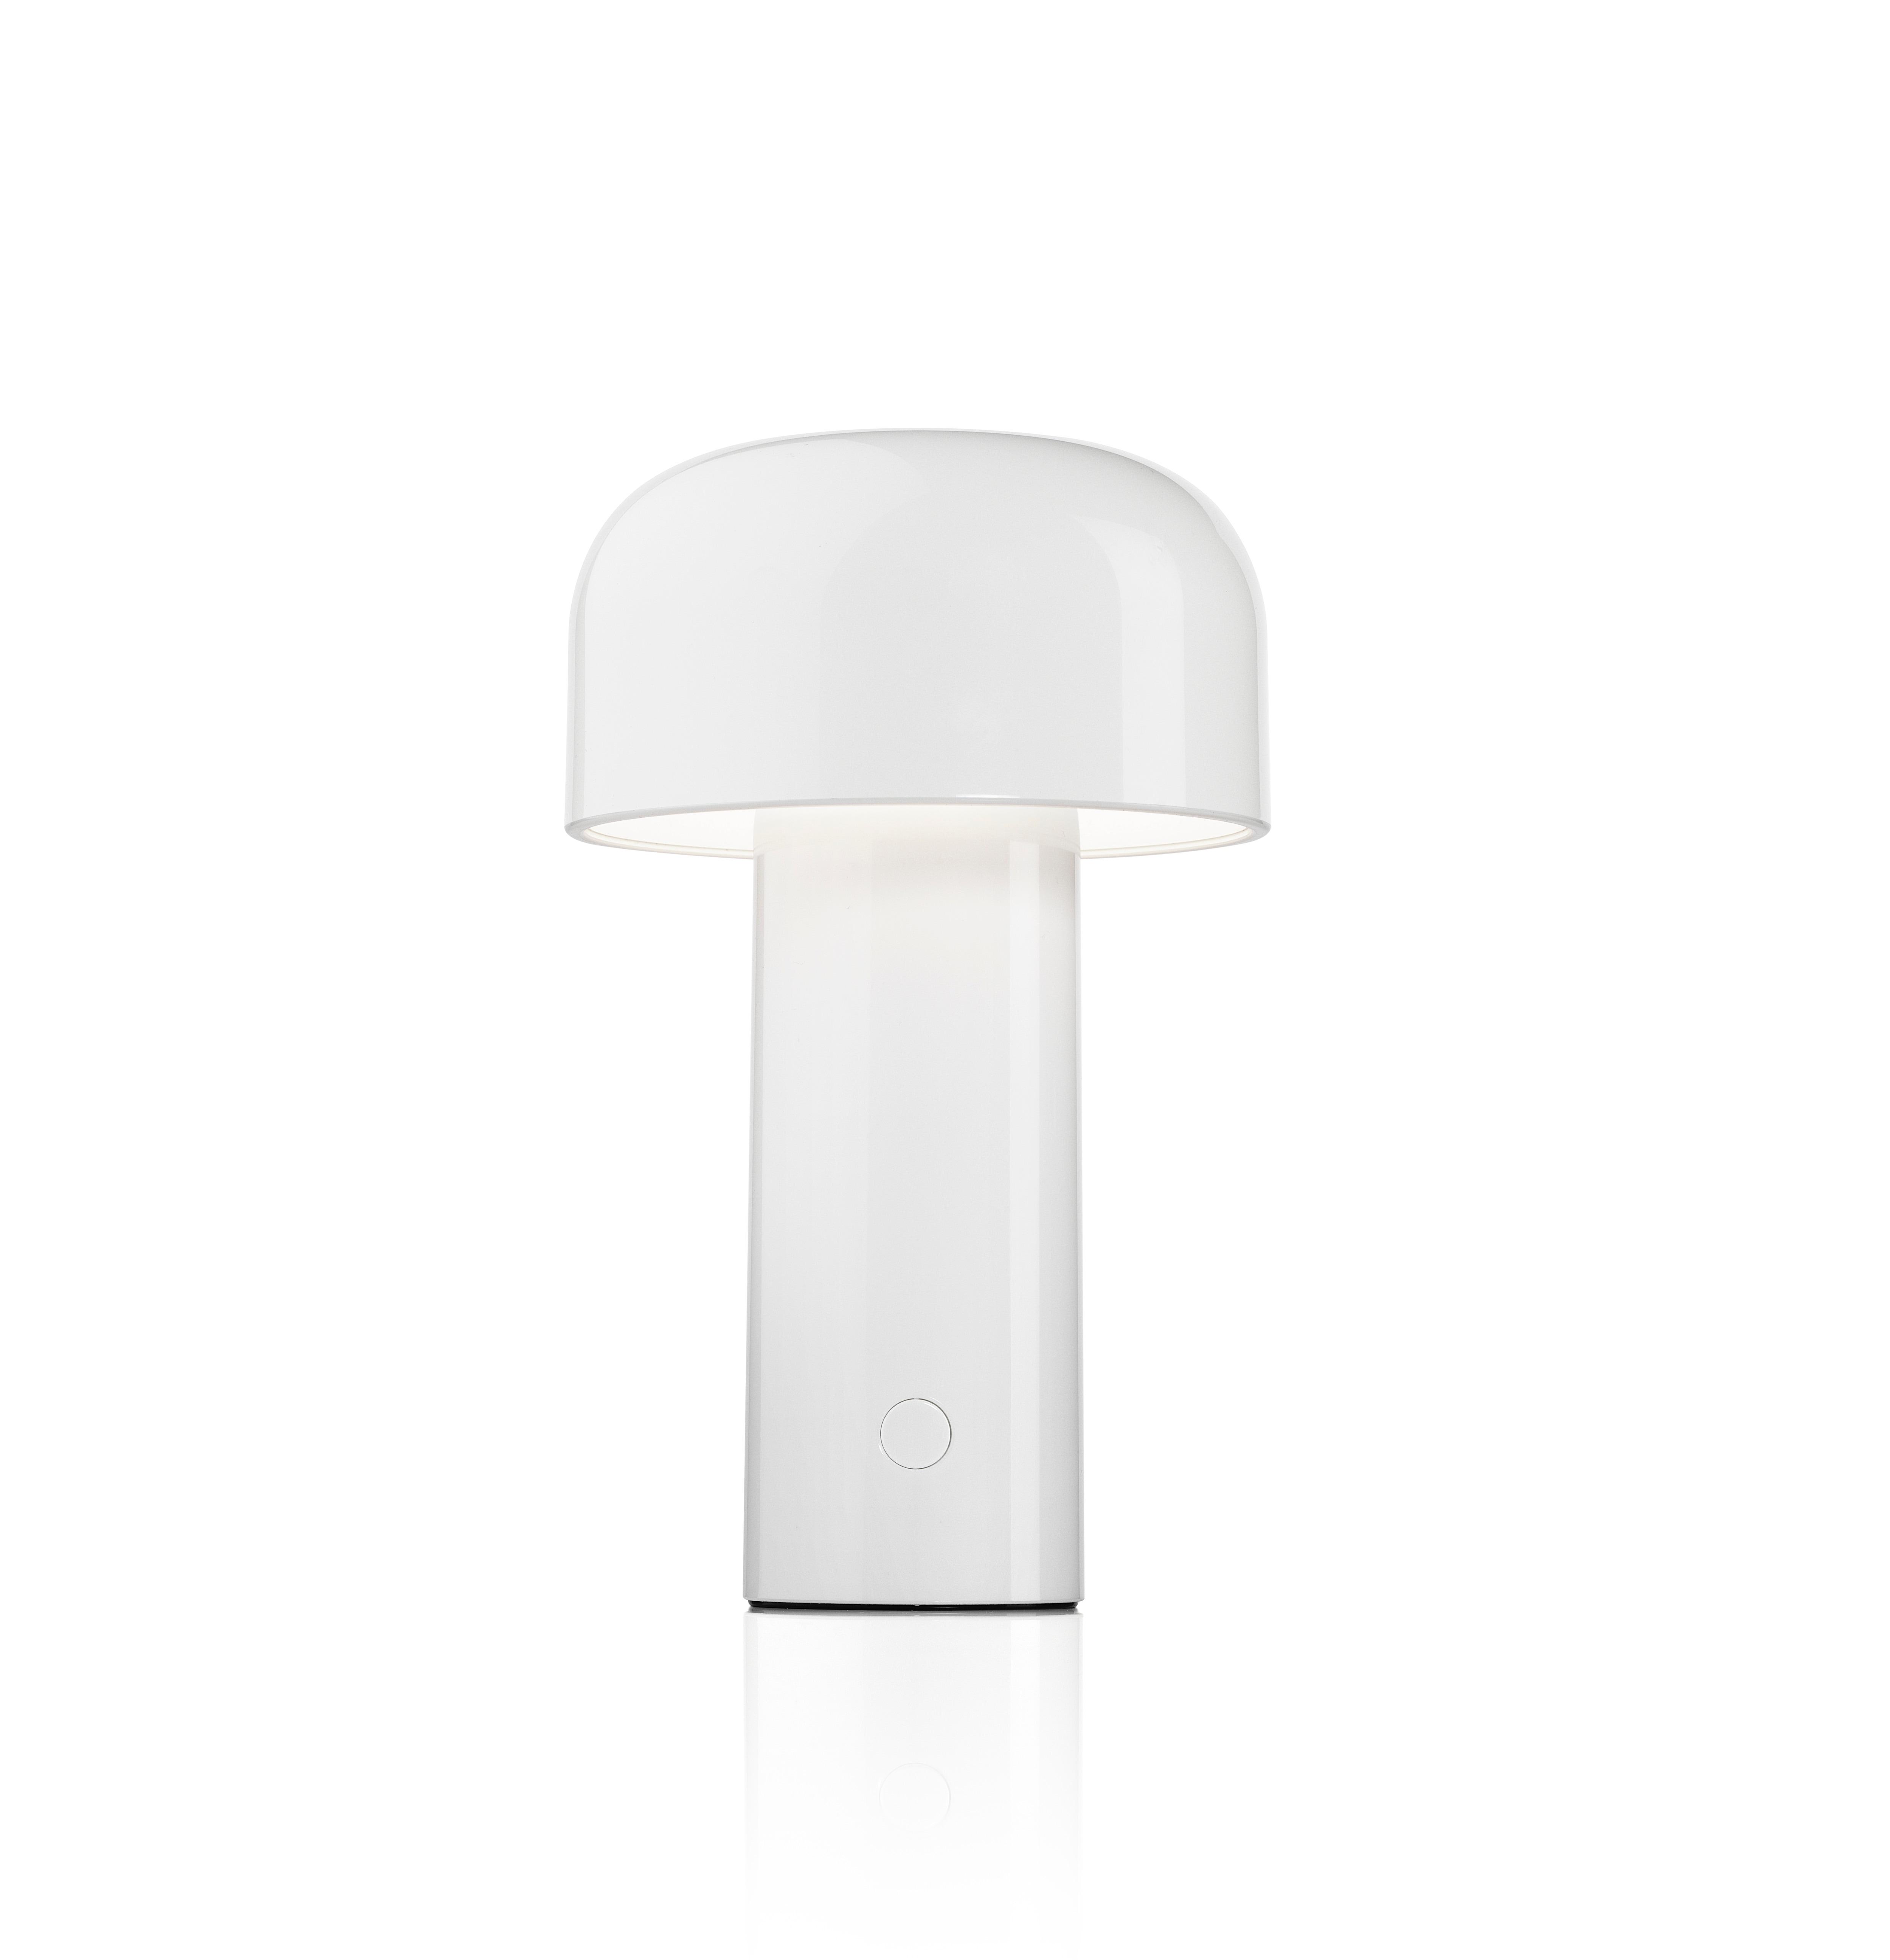 Bellhop bordslampa vit